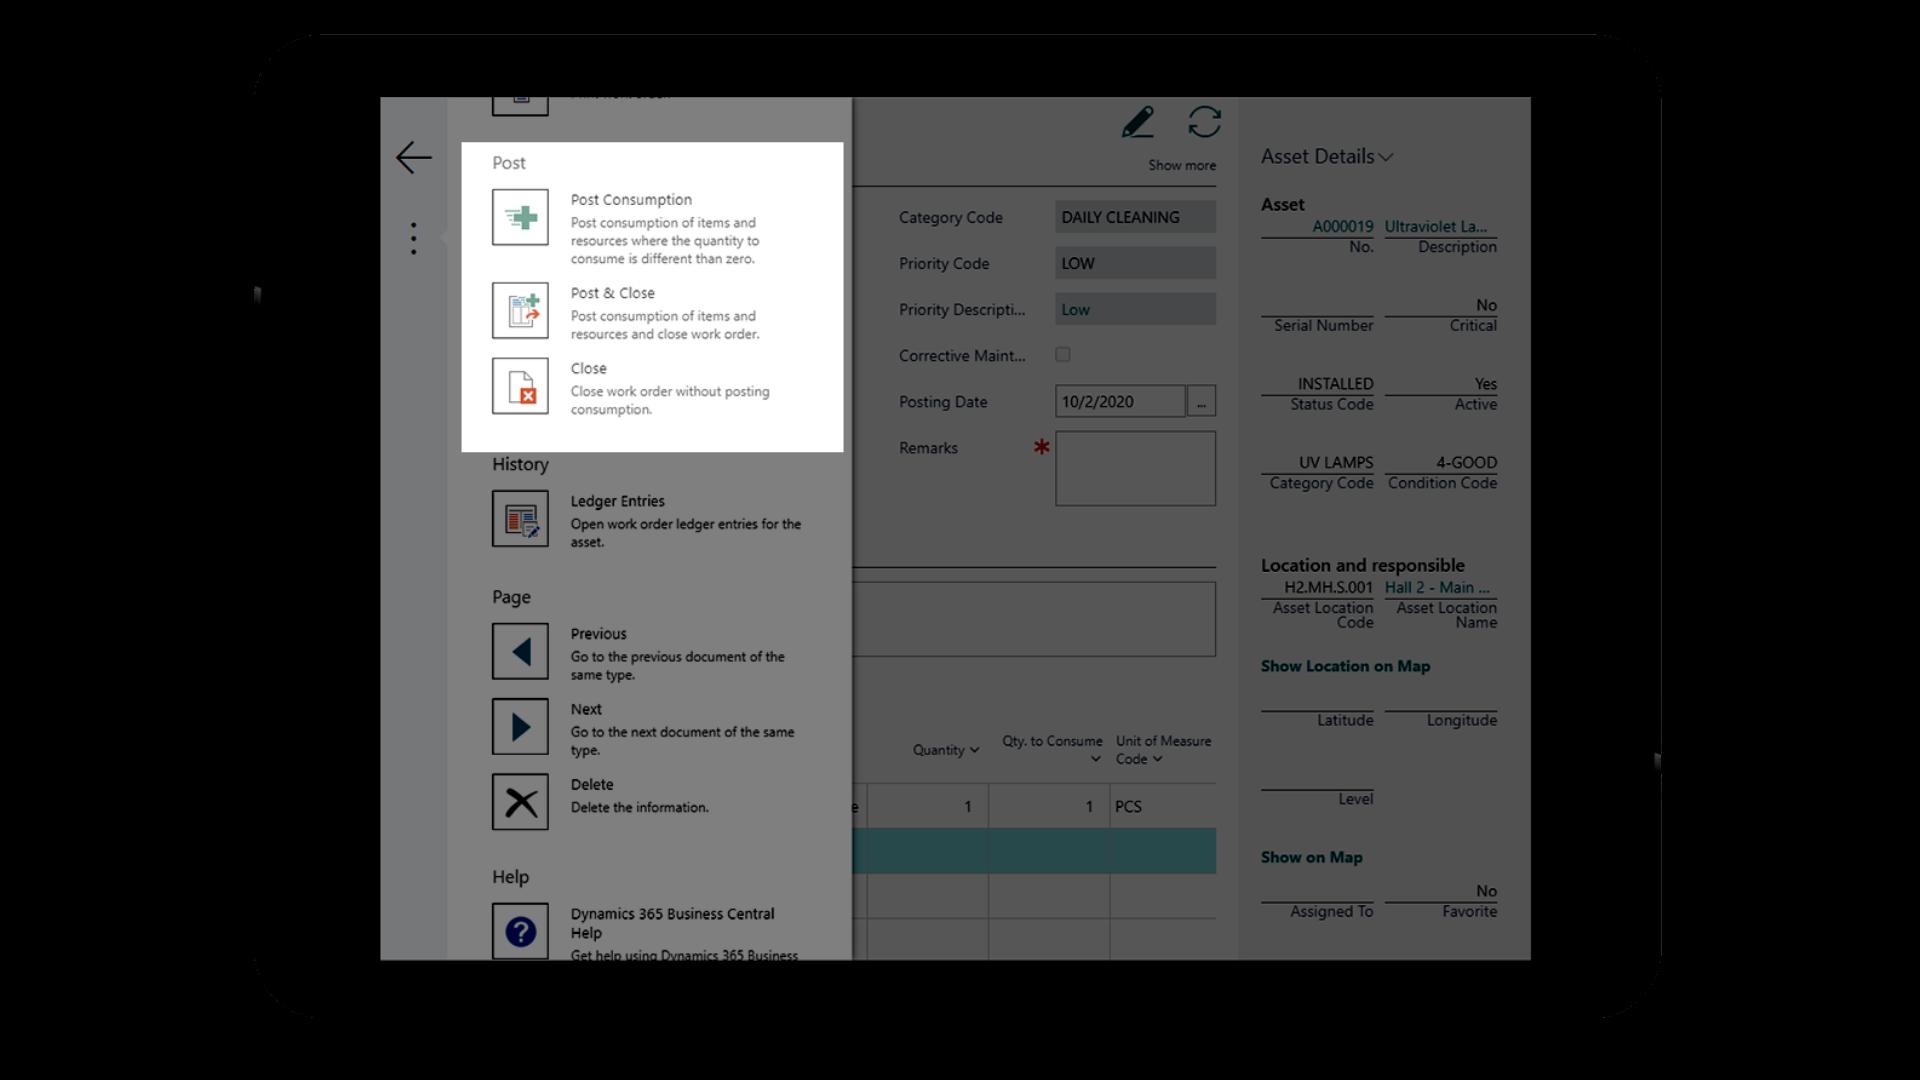 Landing page screenshots (1)